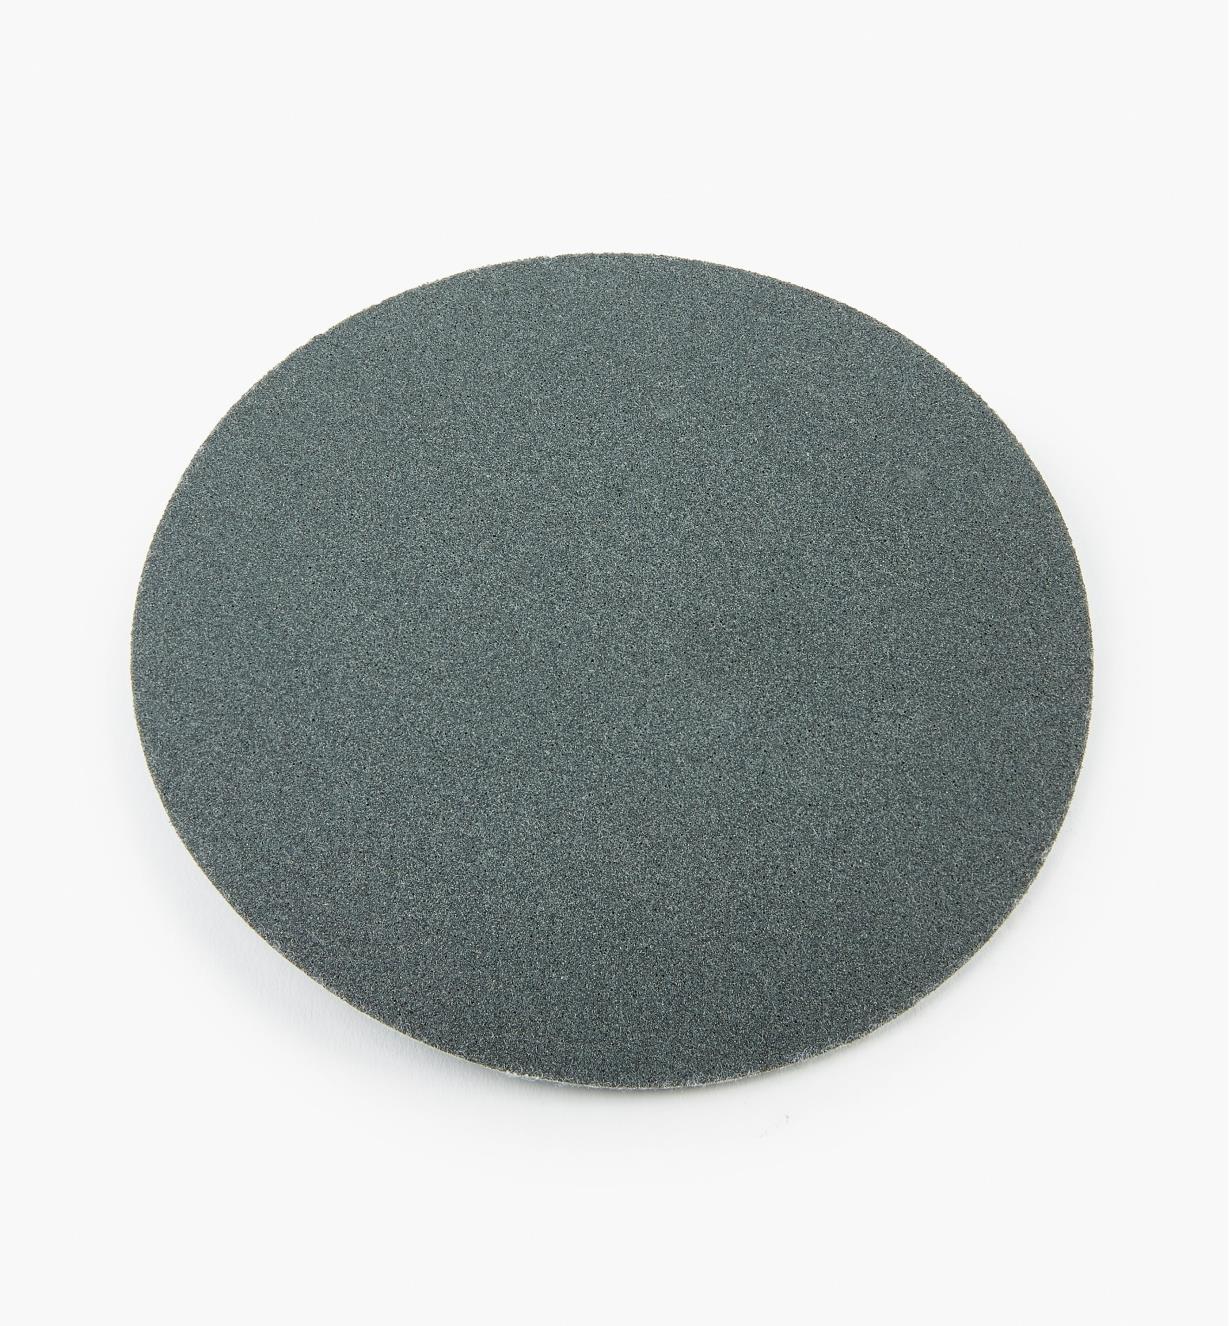 54K9030 - 1500x Micro-Mesh Disc, ea.